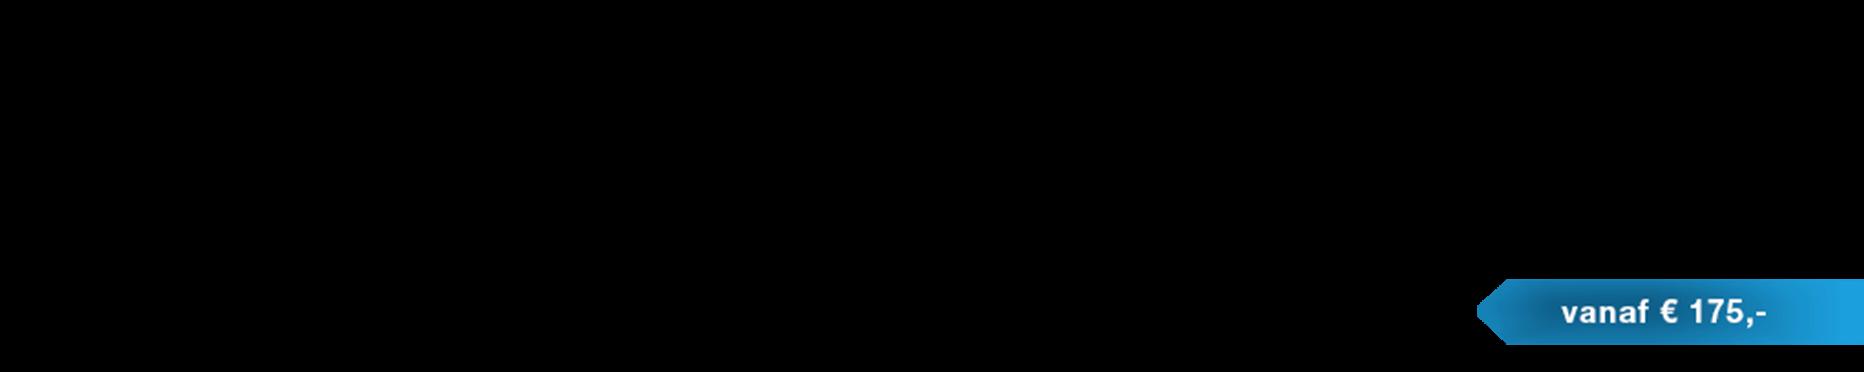 Samenvatting wijzigingen Bouwbesluit 2012 per 1 juli 2015